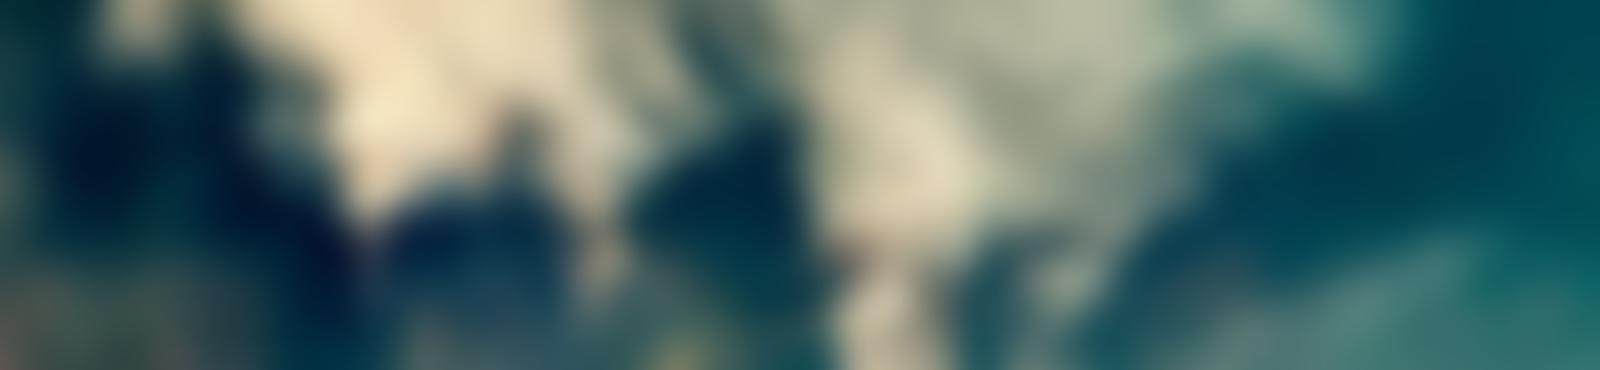 Blurred a3d7281b 4c42 432e 8ae7 9b170f3faea3